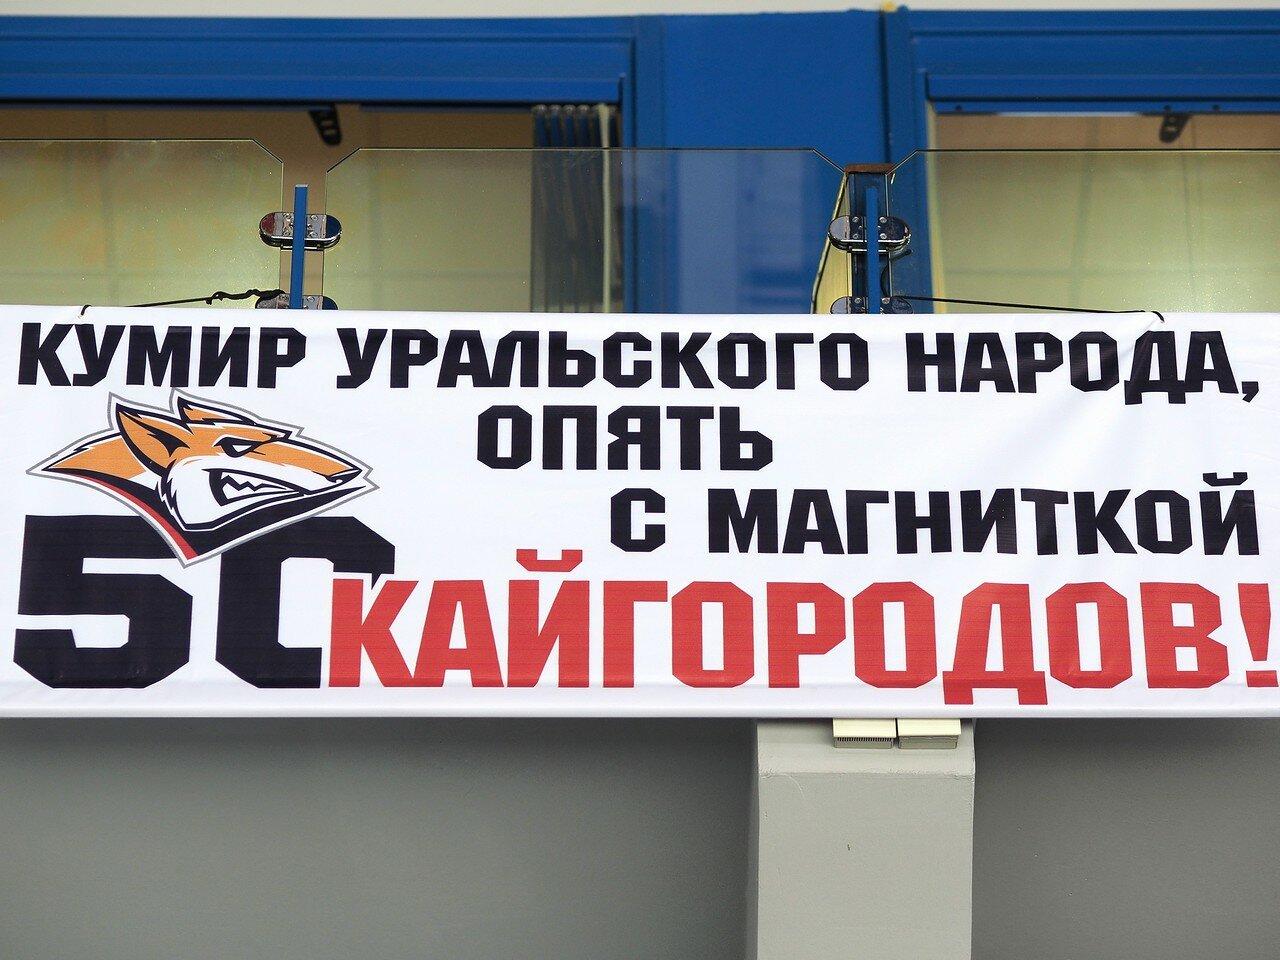 158Восток 1/2 плей-офф Металлург - Сибирь 08.03.2016